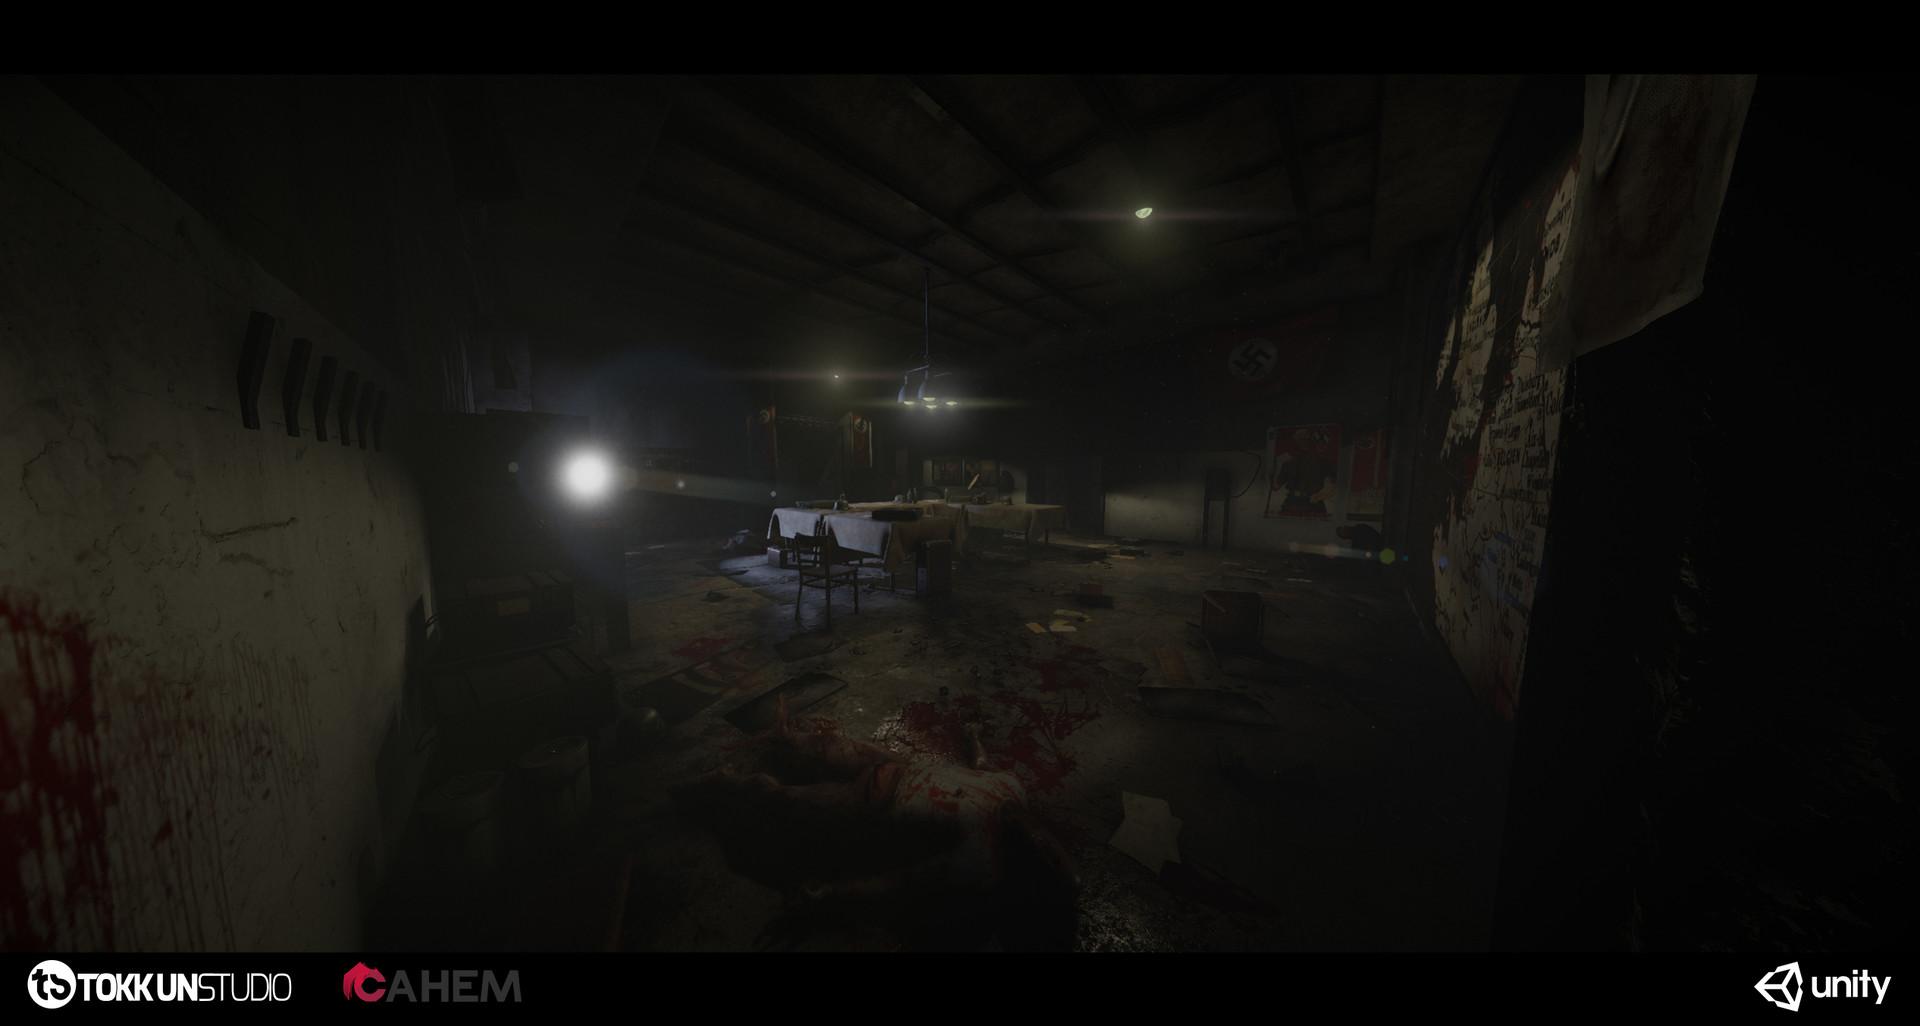 Tokkun studio bunker shot 42